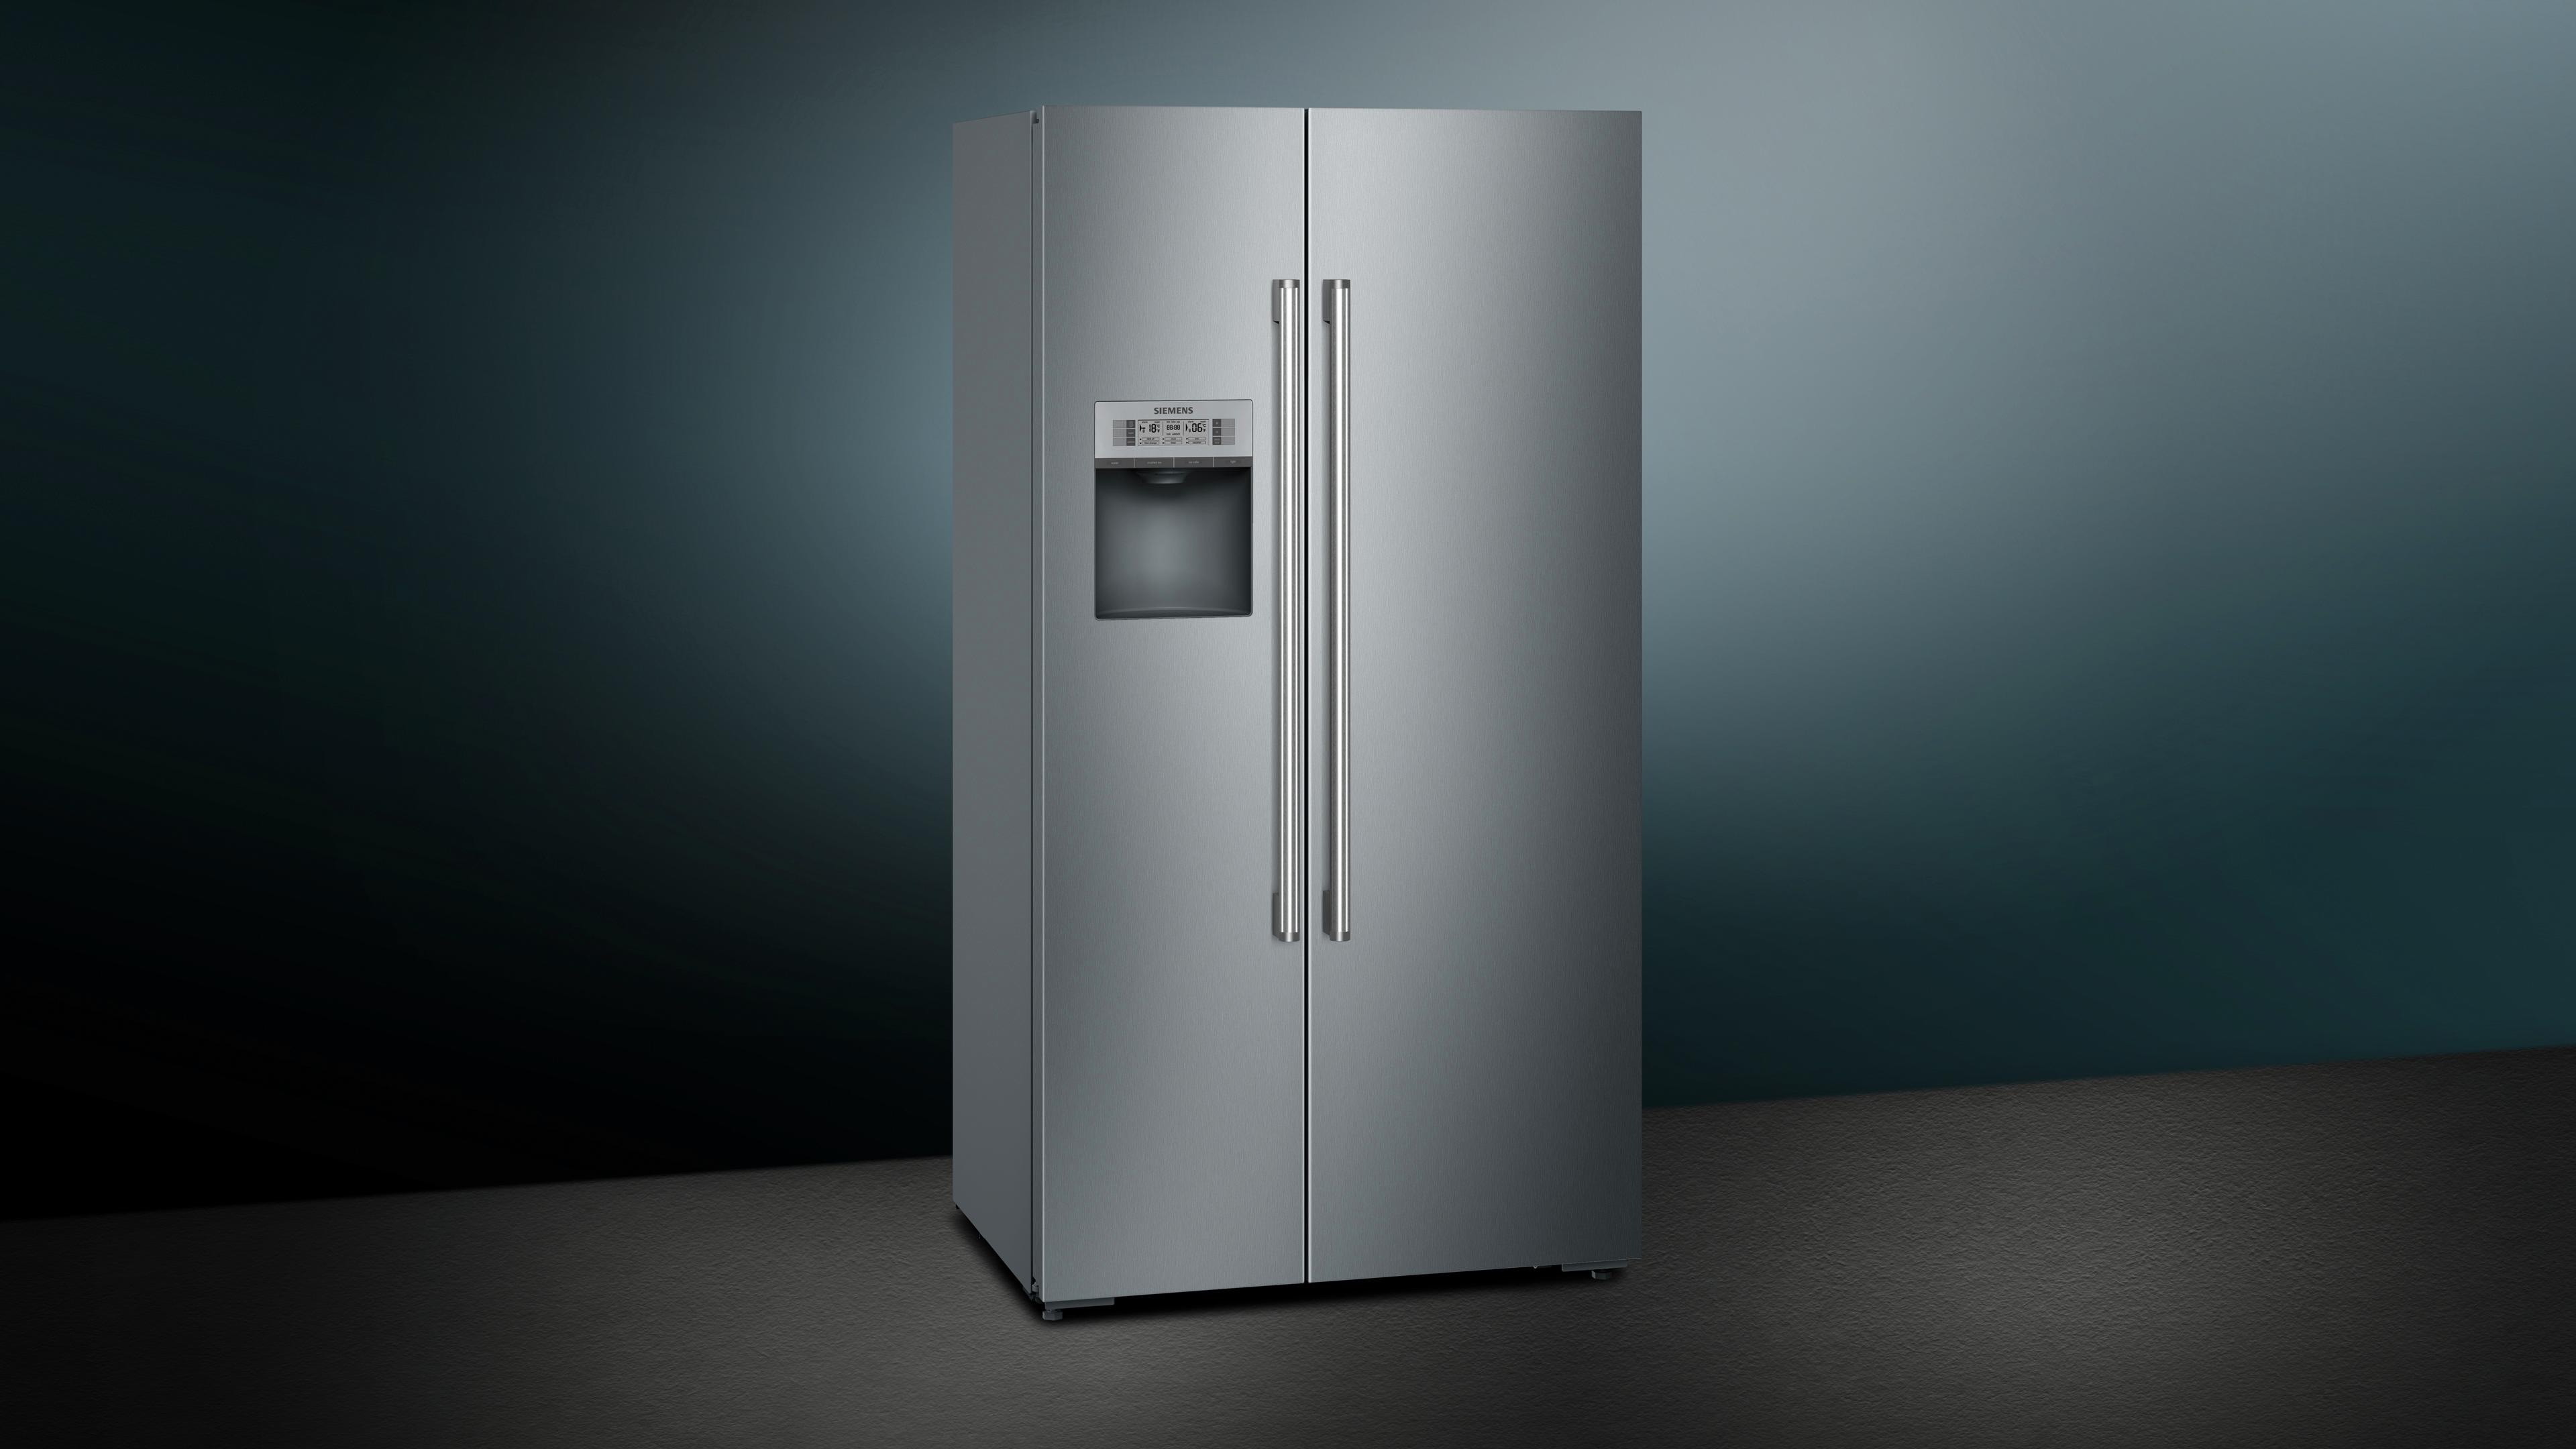 Amerikanischer Kühlschrank Tiefe 60 Cm : Side by side kühlschrank siemens electrogeräte gmbh ka dhi